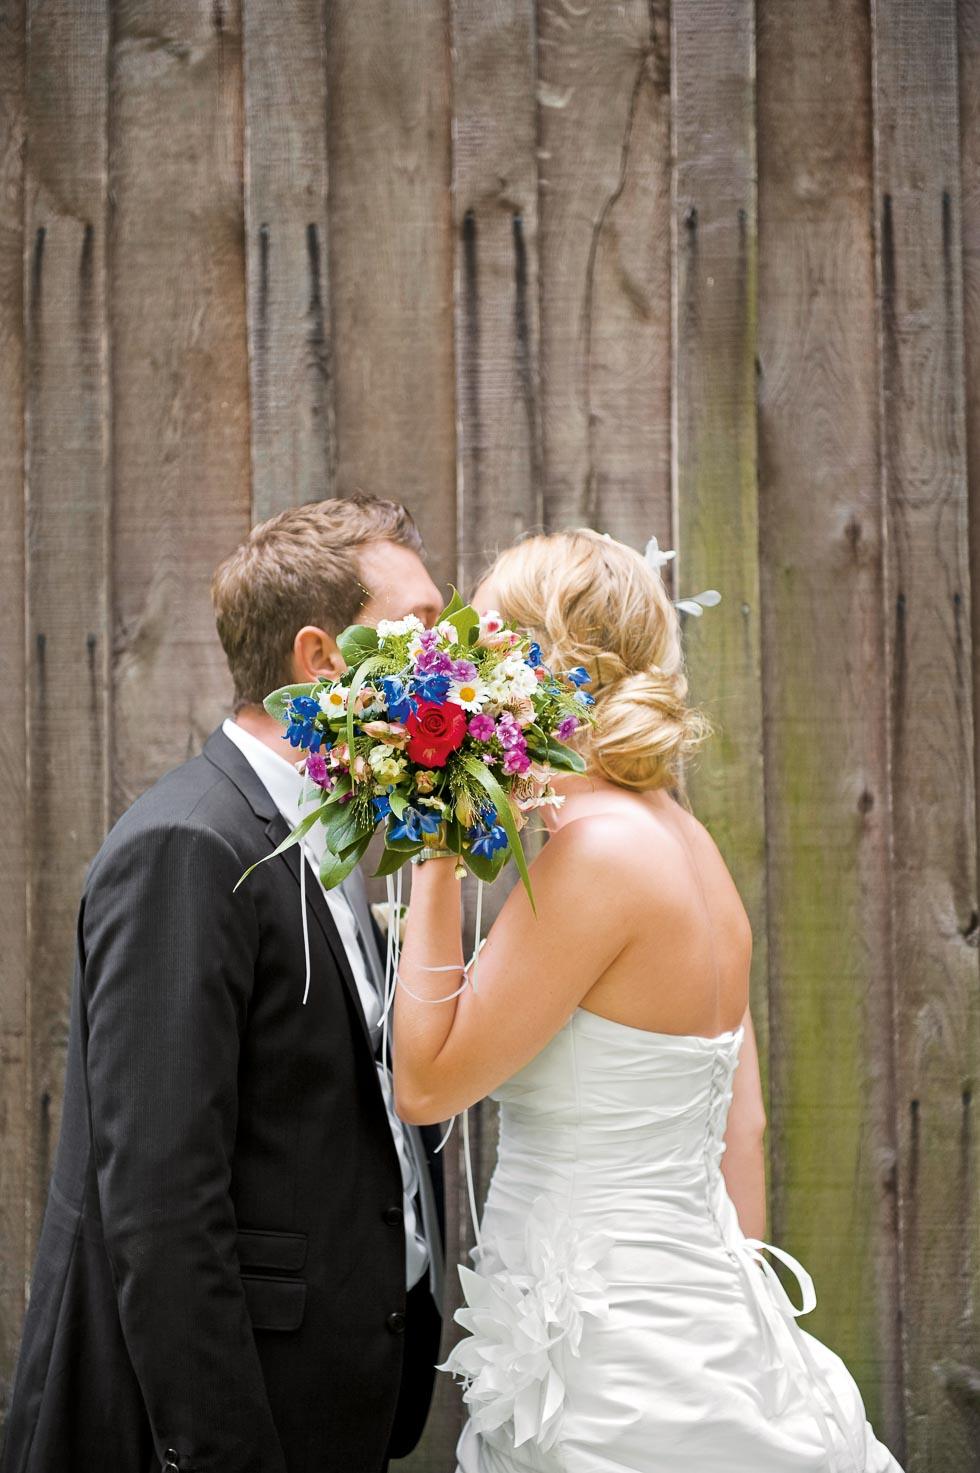 Brautstrauß Blau, Weiß un Rot